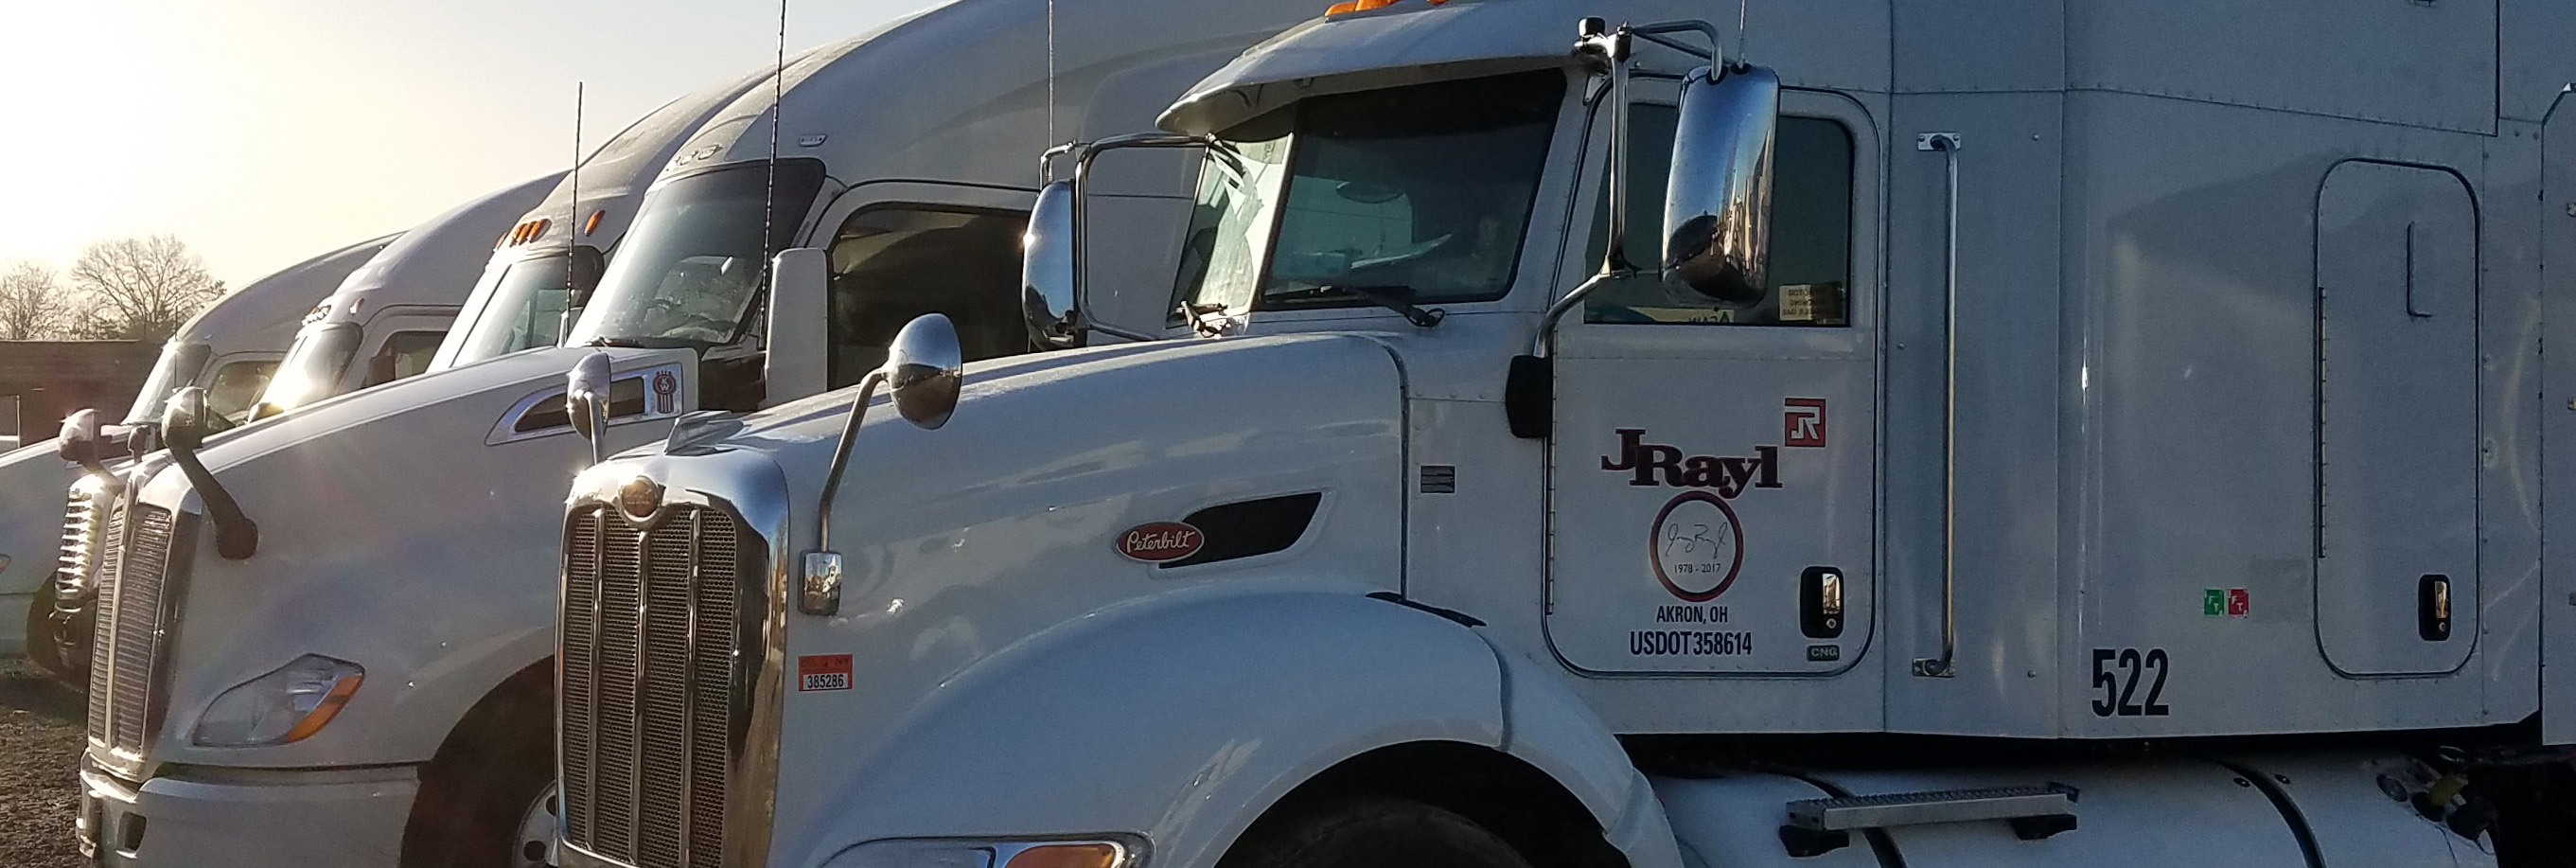 texas commercial motor vehicle drivers handbook 2017